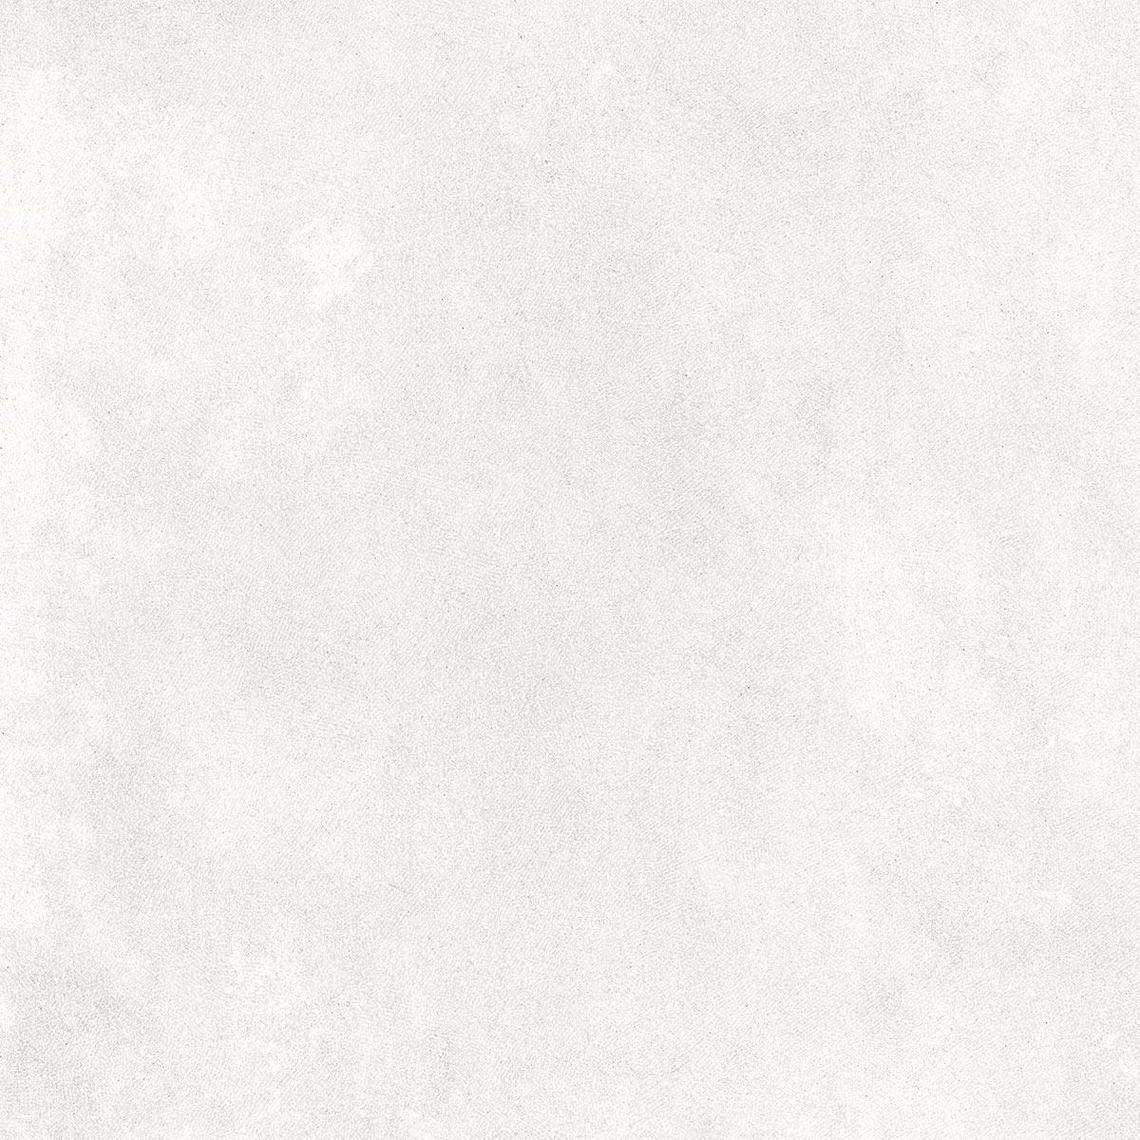 HERMES LIMESTONE MATT RECT. (120x120)